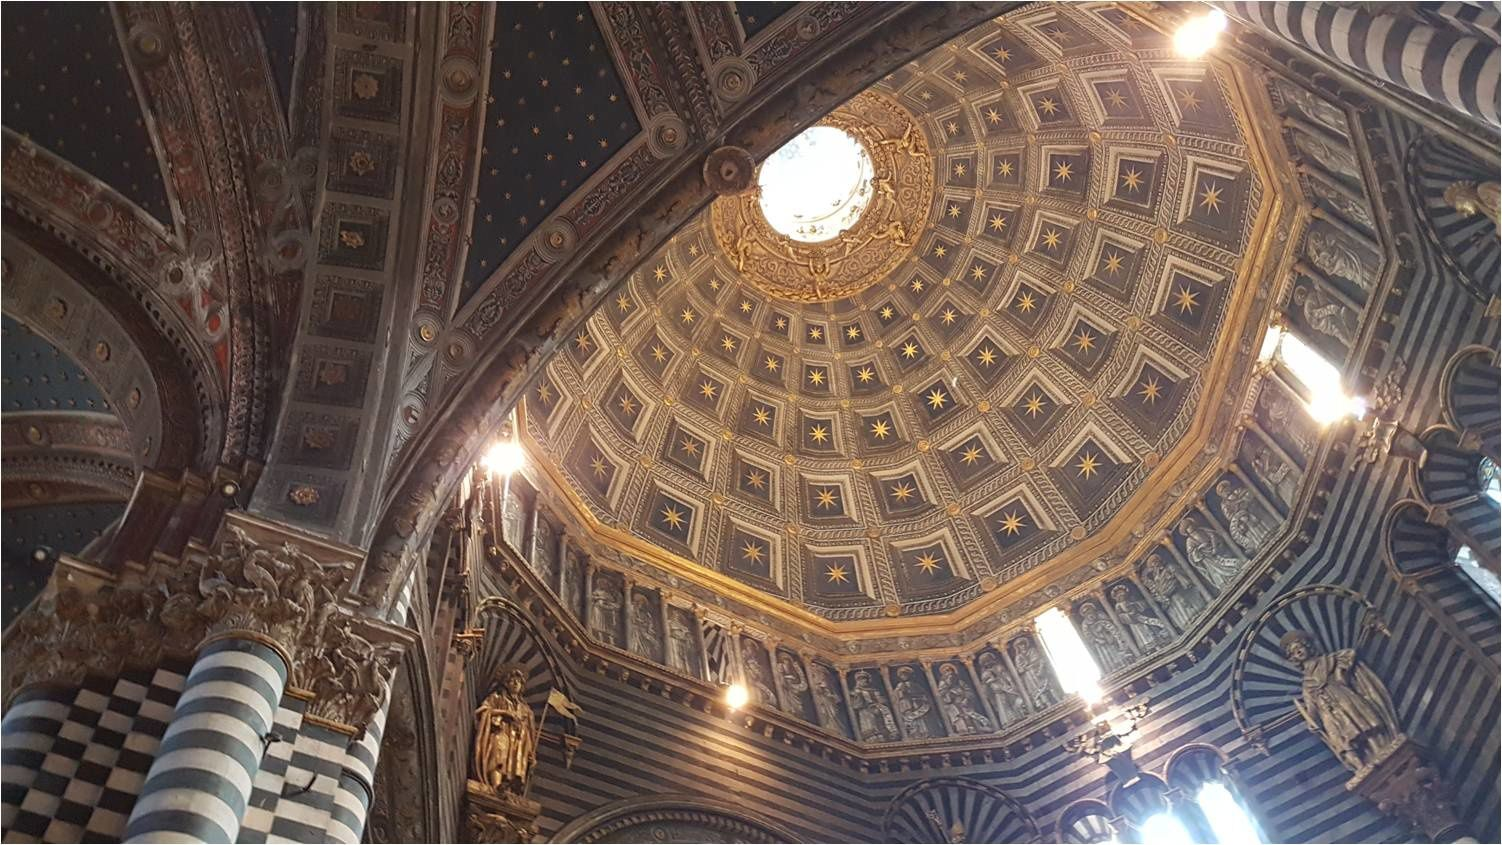 Italie 2017 - Instantané 93